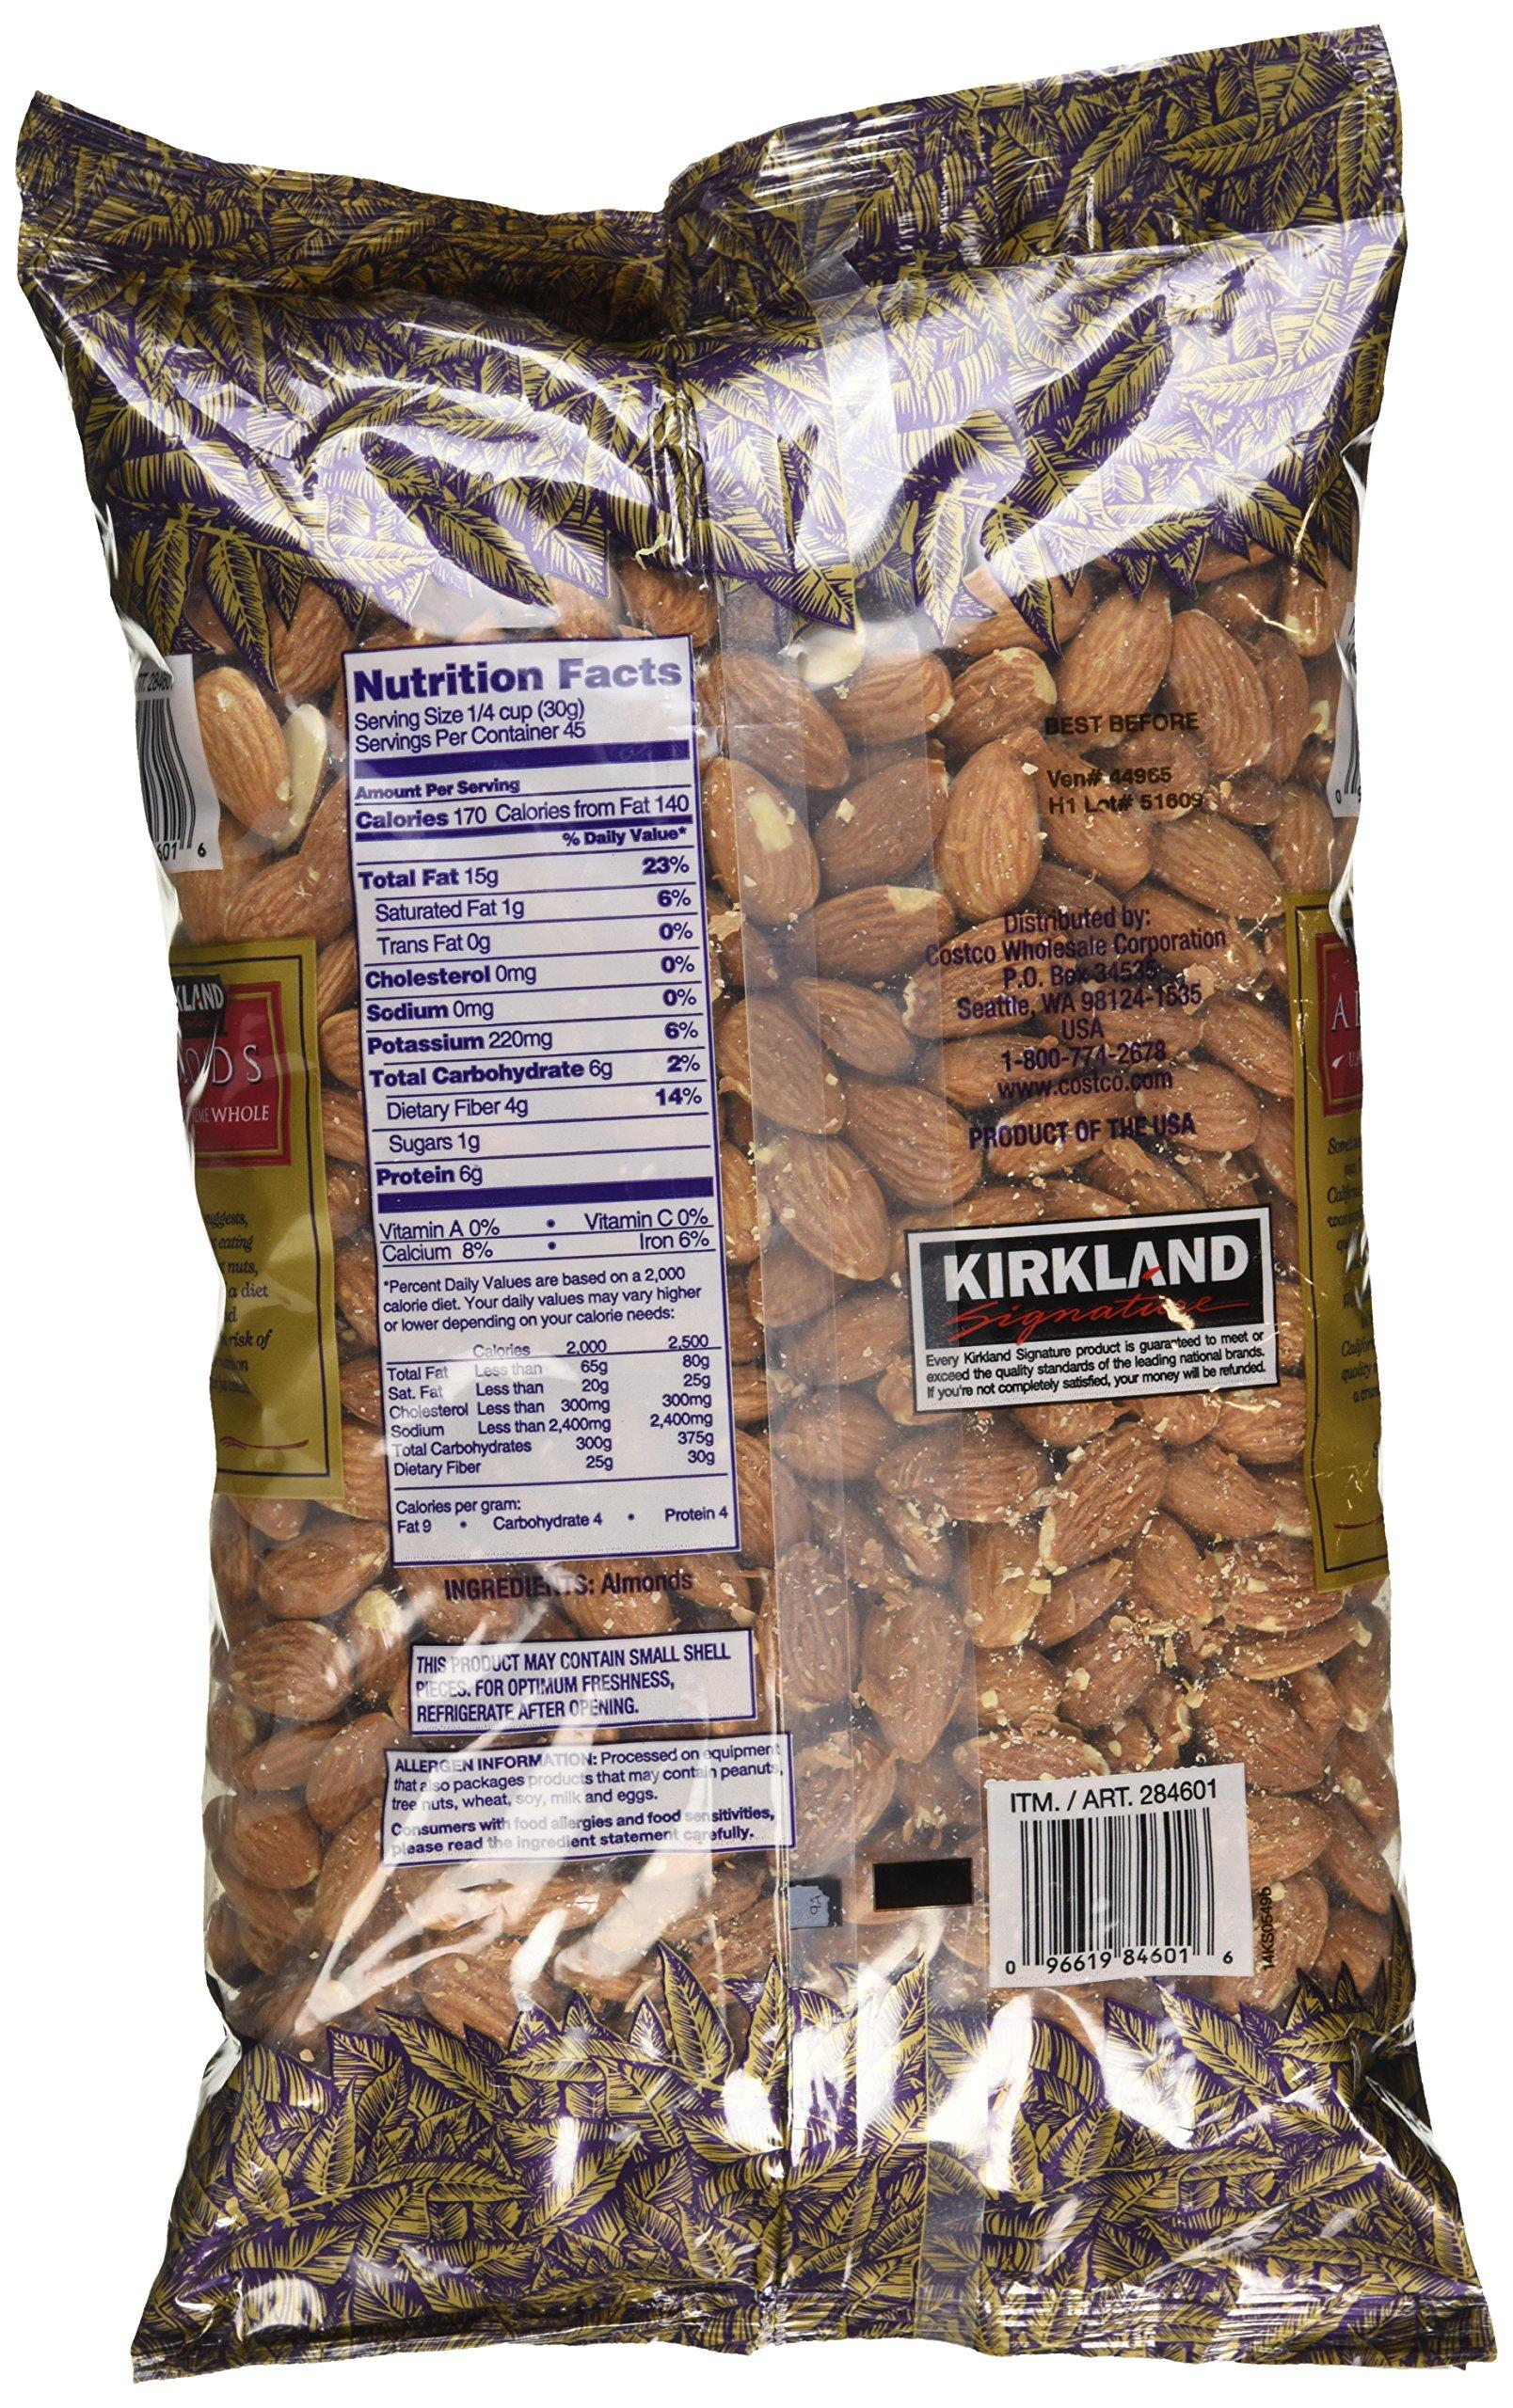 Kirkland Signature Supreme Whole Almonds, 3 Pound by Kirkland Signature (Image #4)